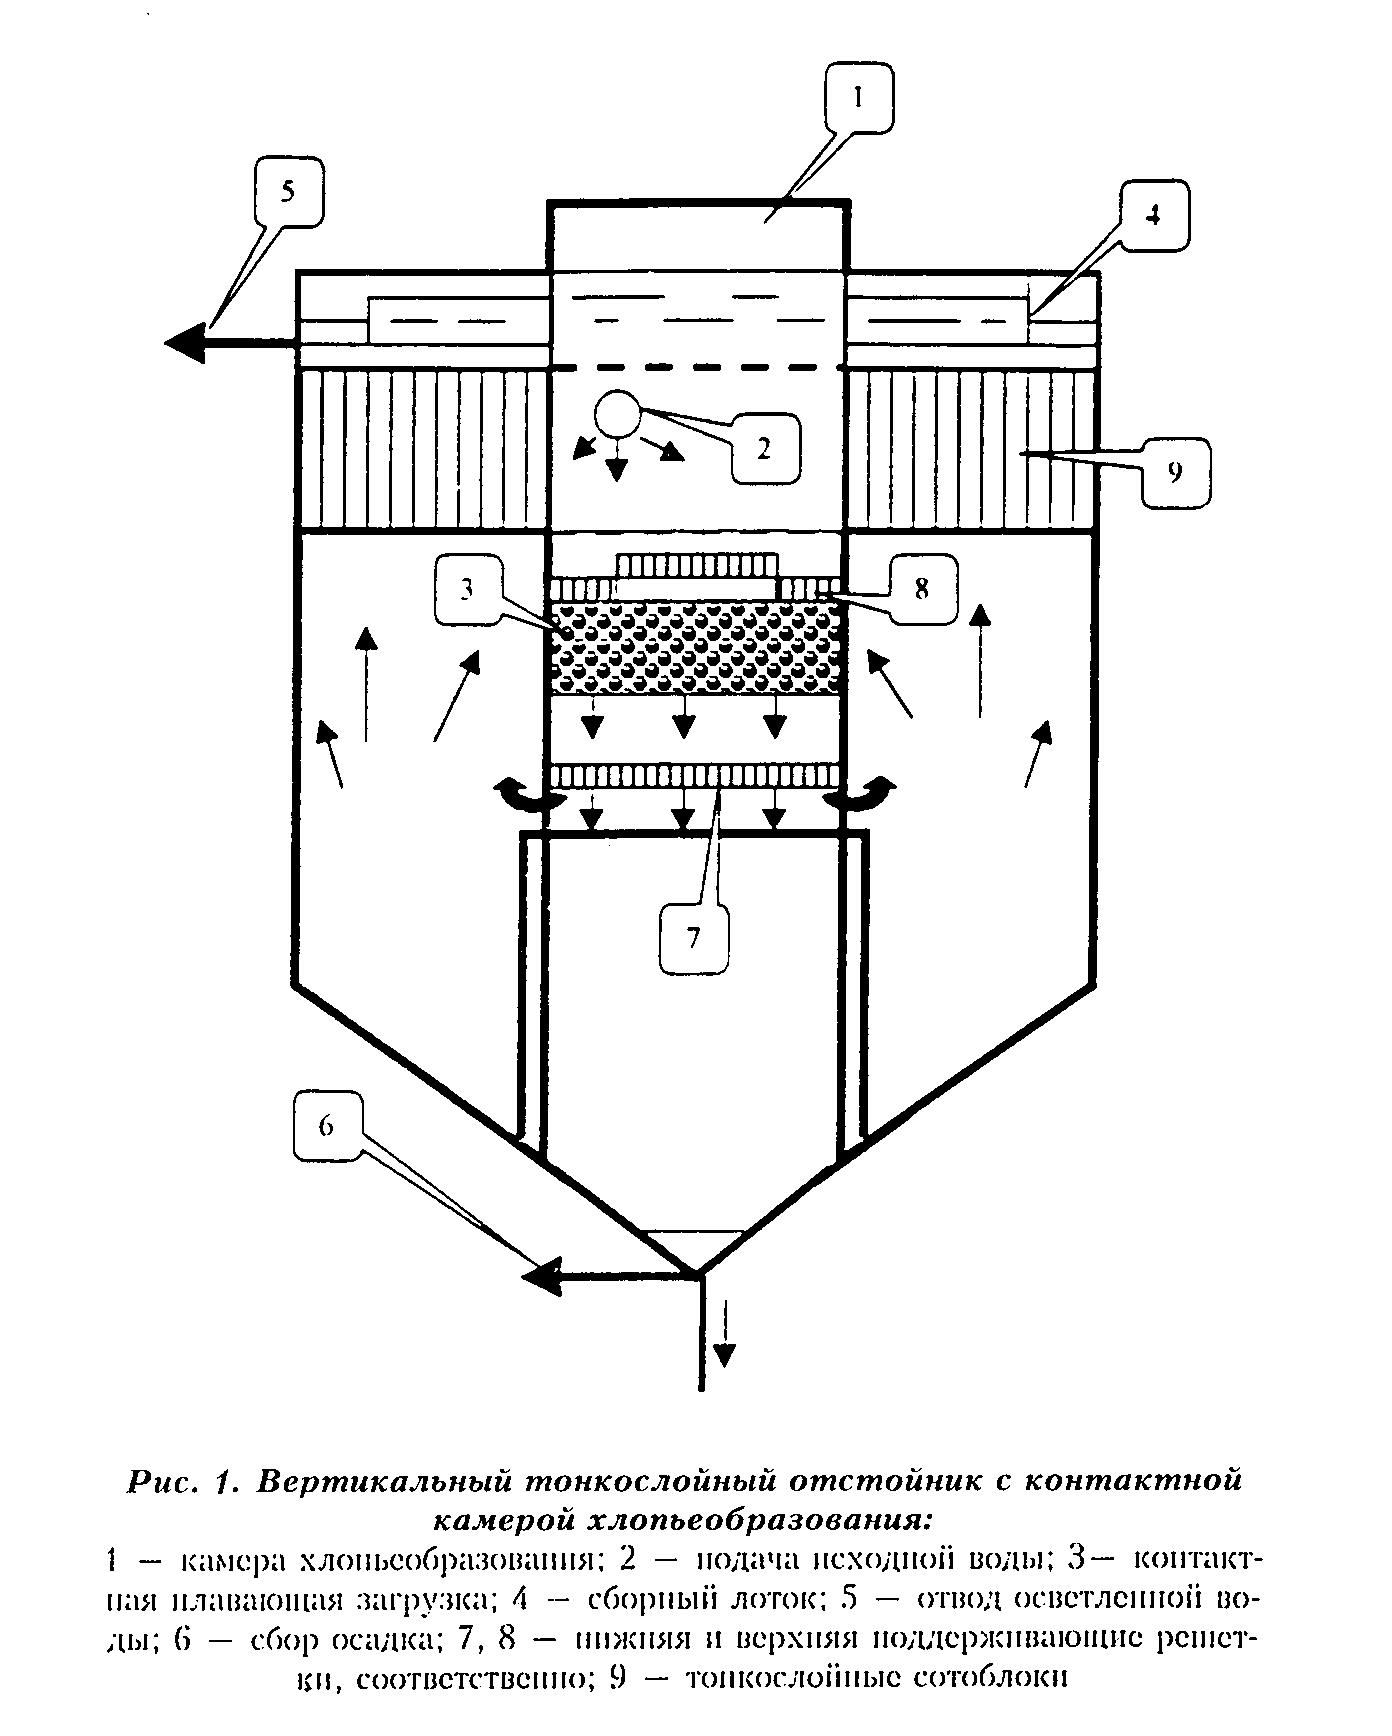 tonkoslojnye otstojniki 2 Тонкослойные отстойники